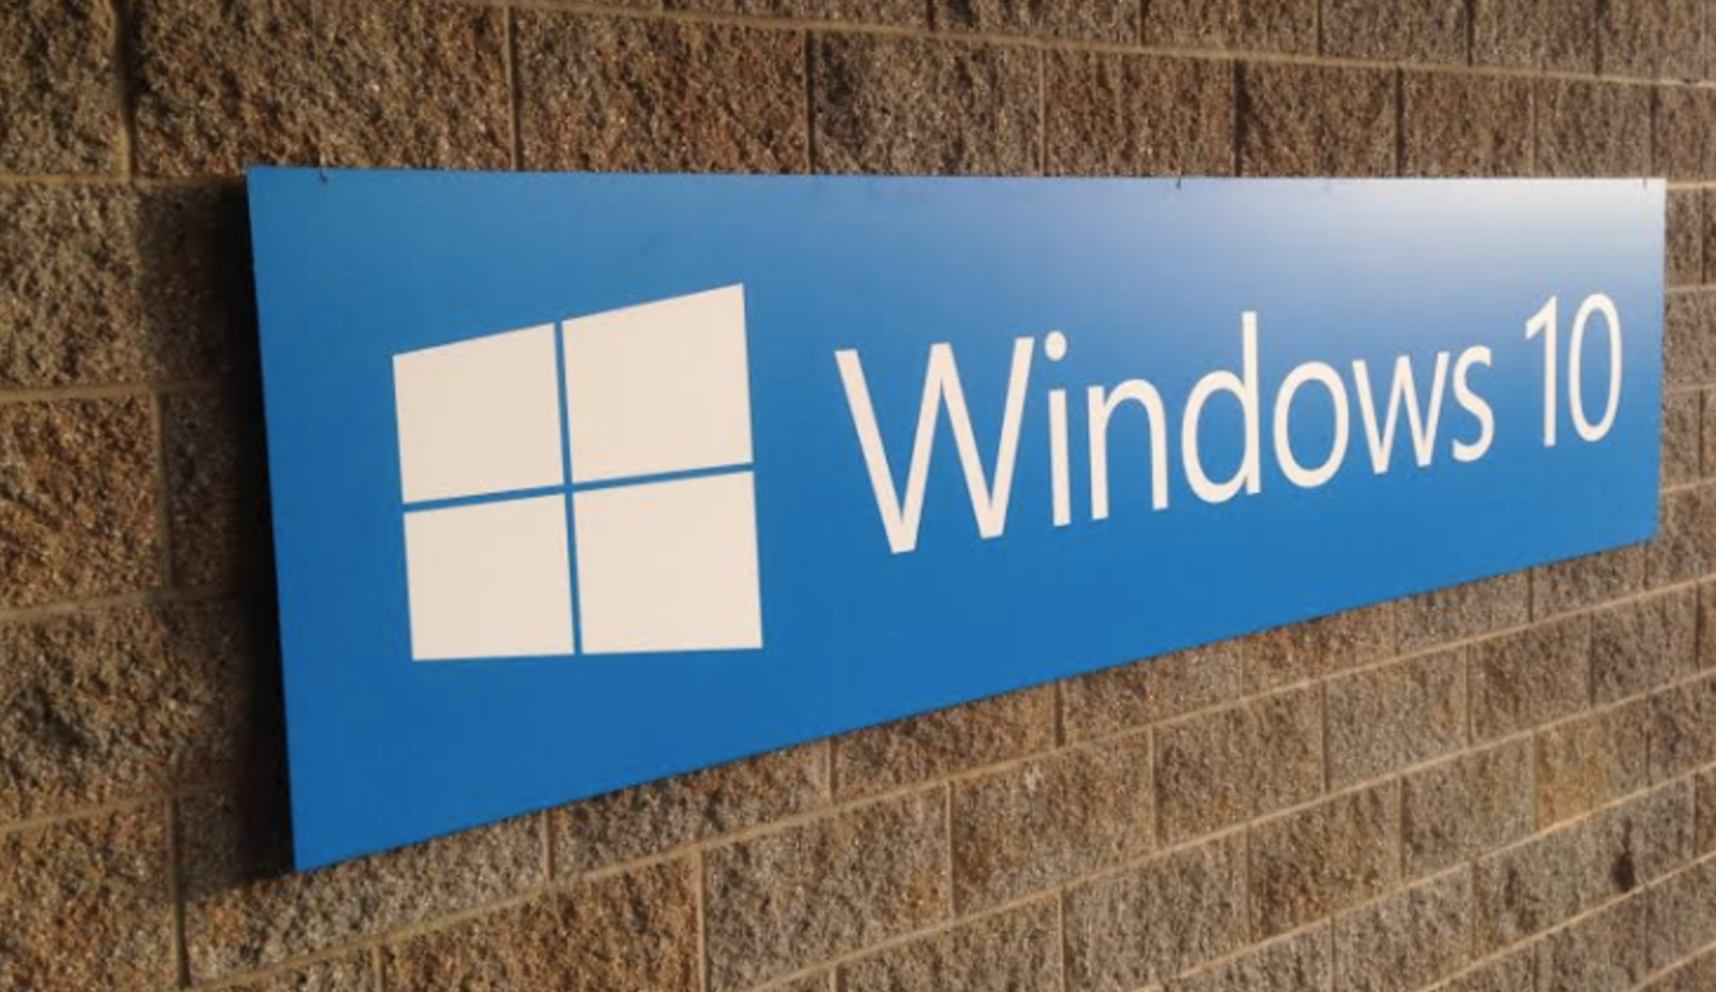 microsoft free for windows 10